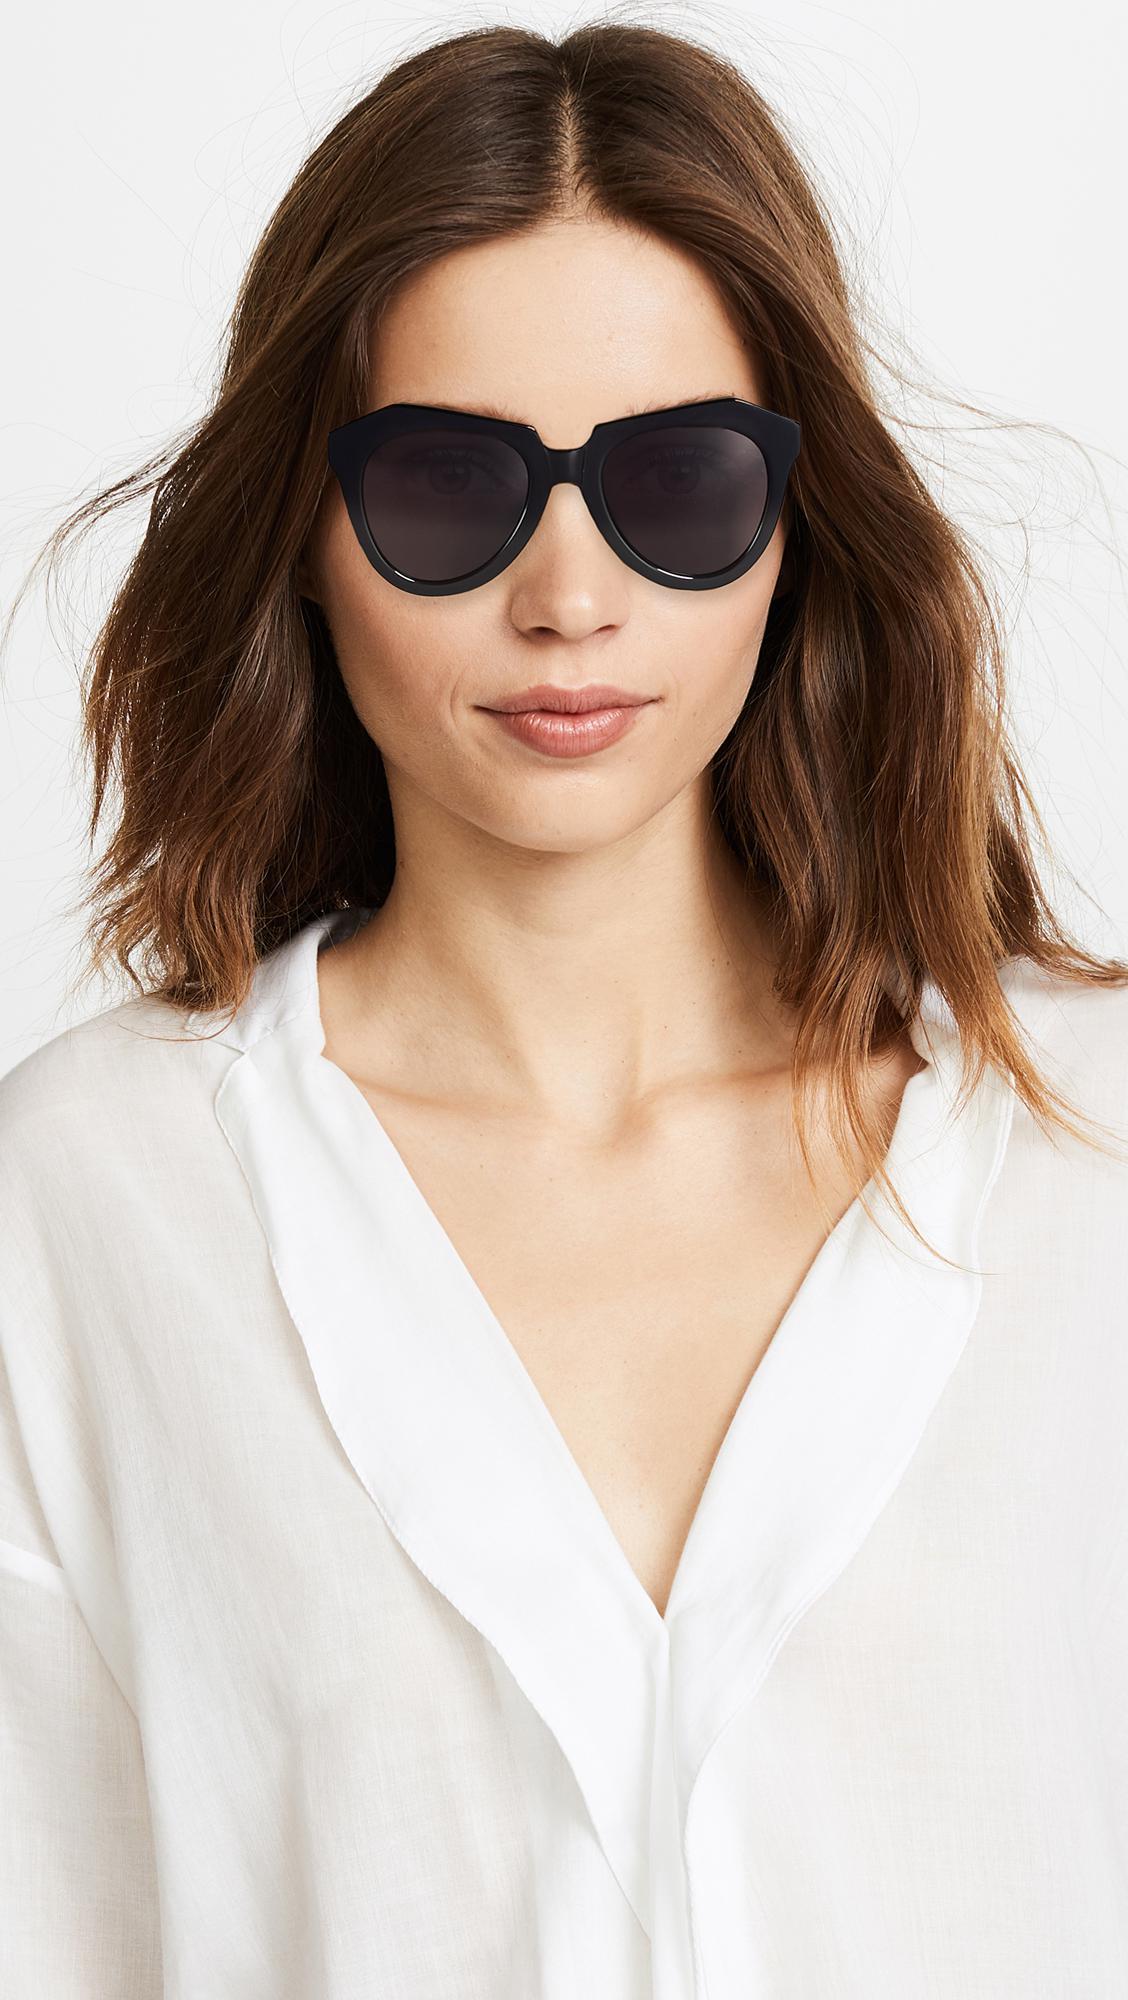 15ebf611680 Lyst - Karen Walker Number One Sunglasses in Black - Save 12%